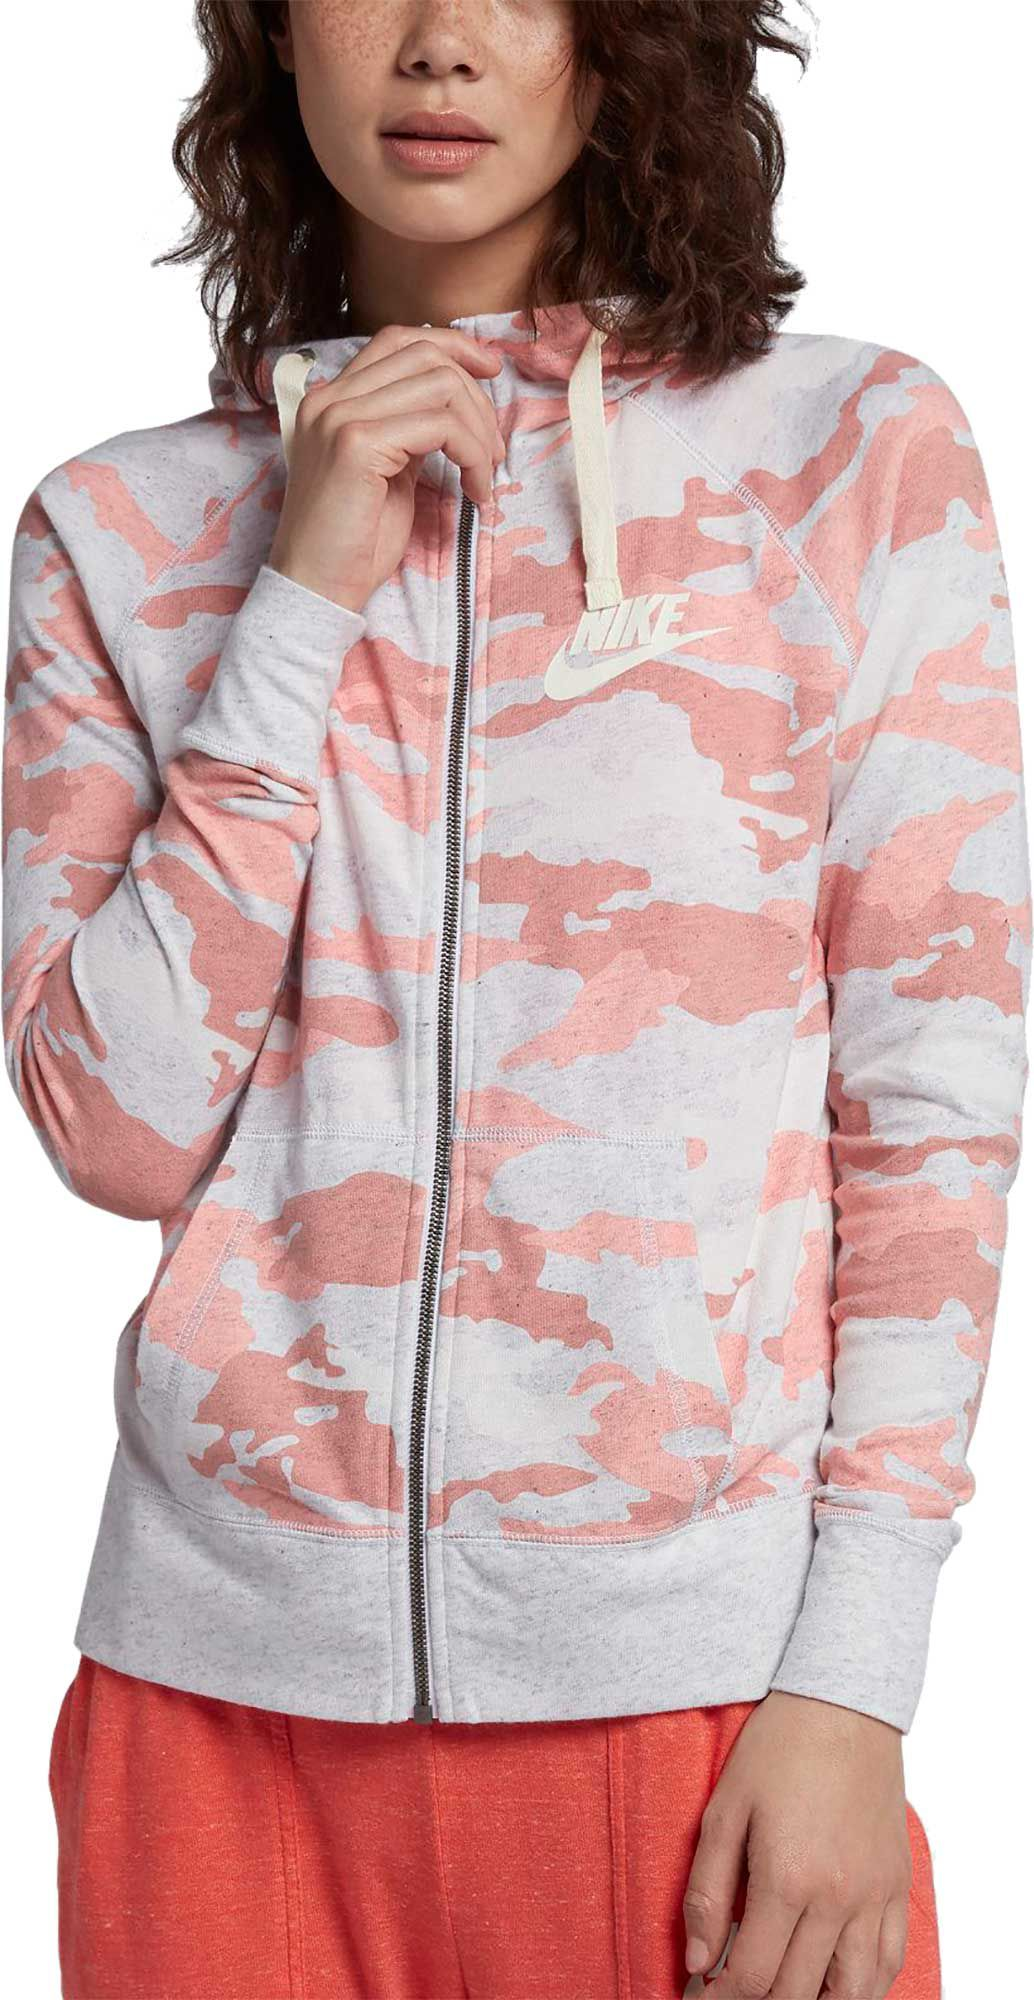 Nike Women's Sportswear Gym Vintage Camo Full Zip Hoodie